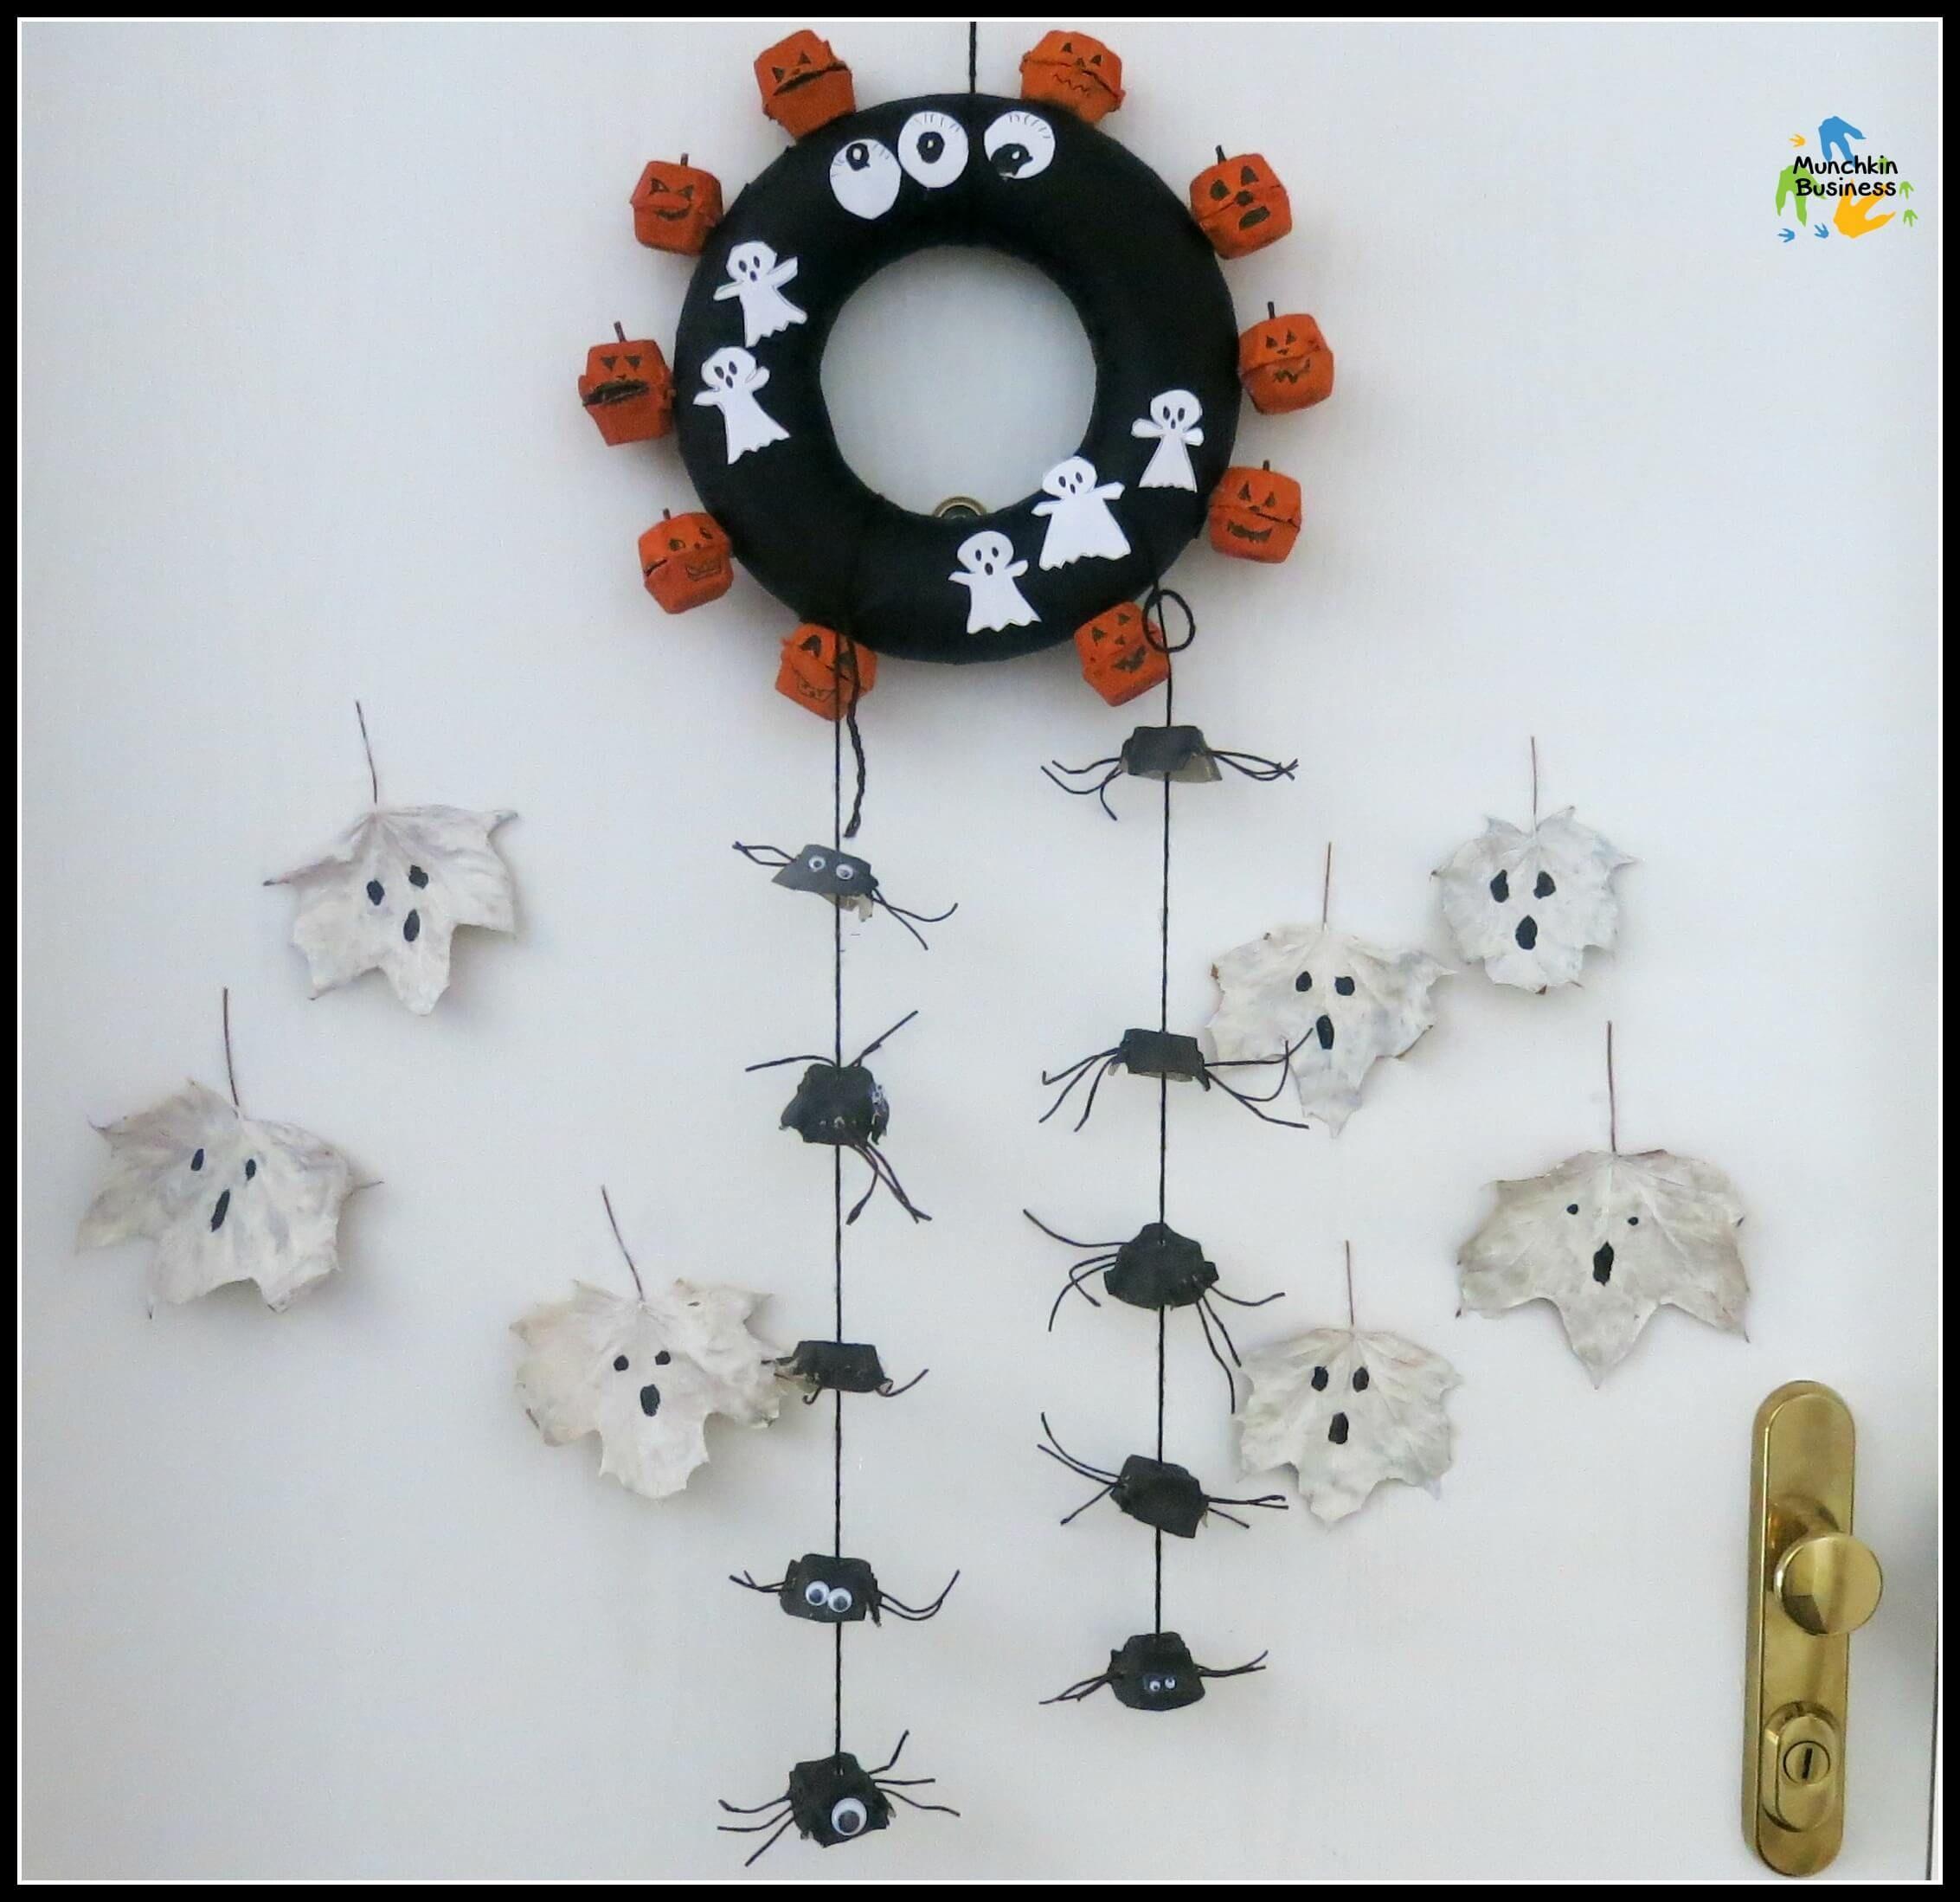 DIY Halloween pumpkin wreath made with recycled egg carton